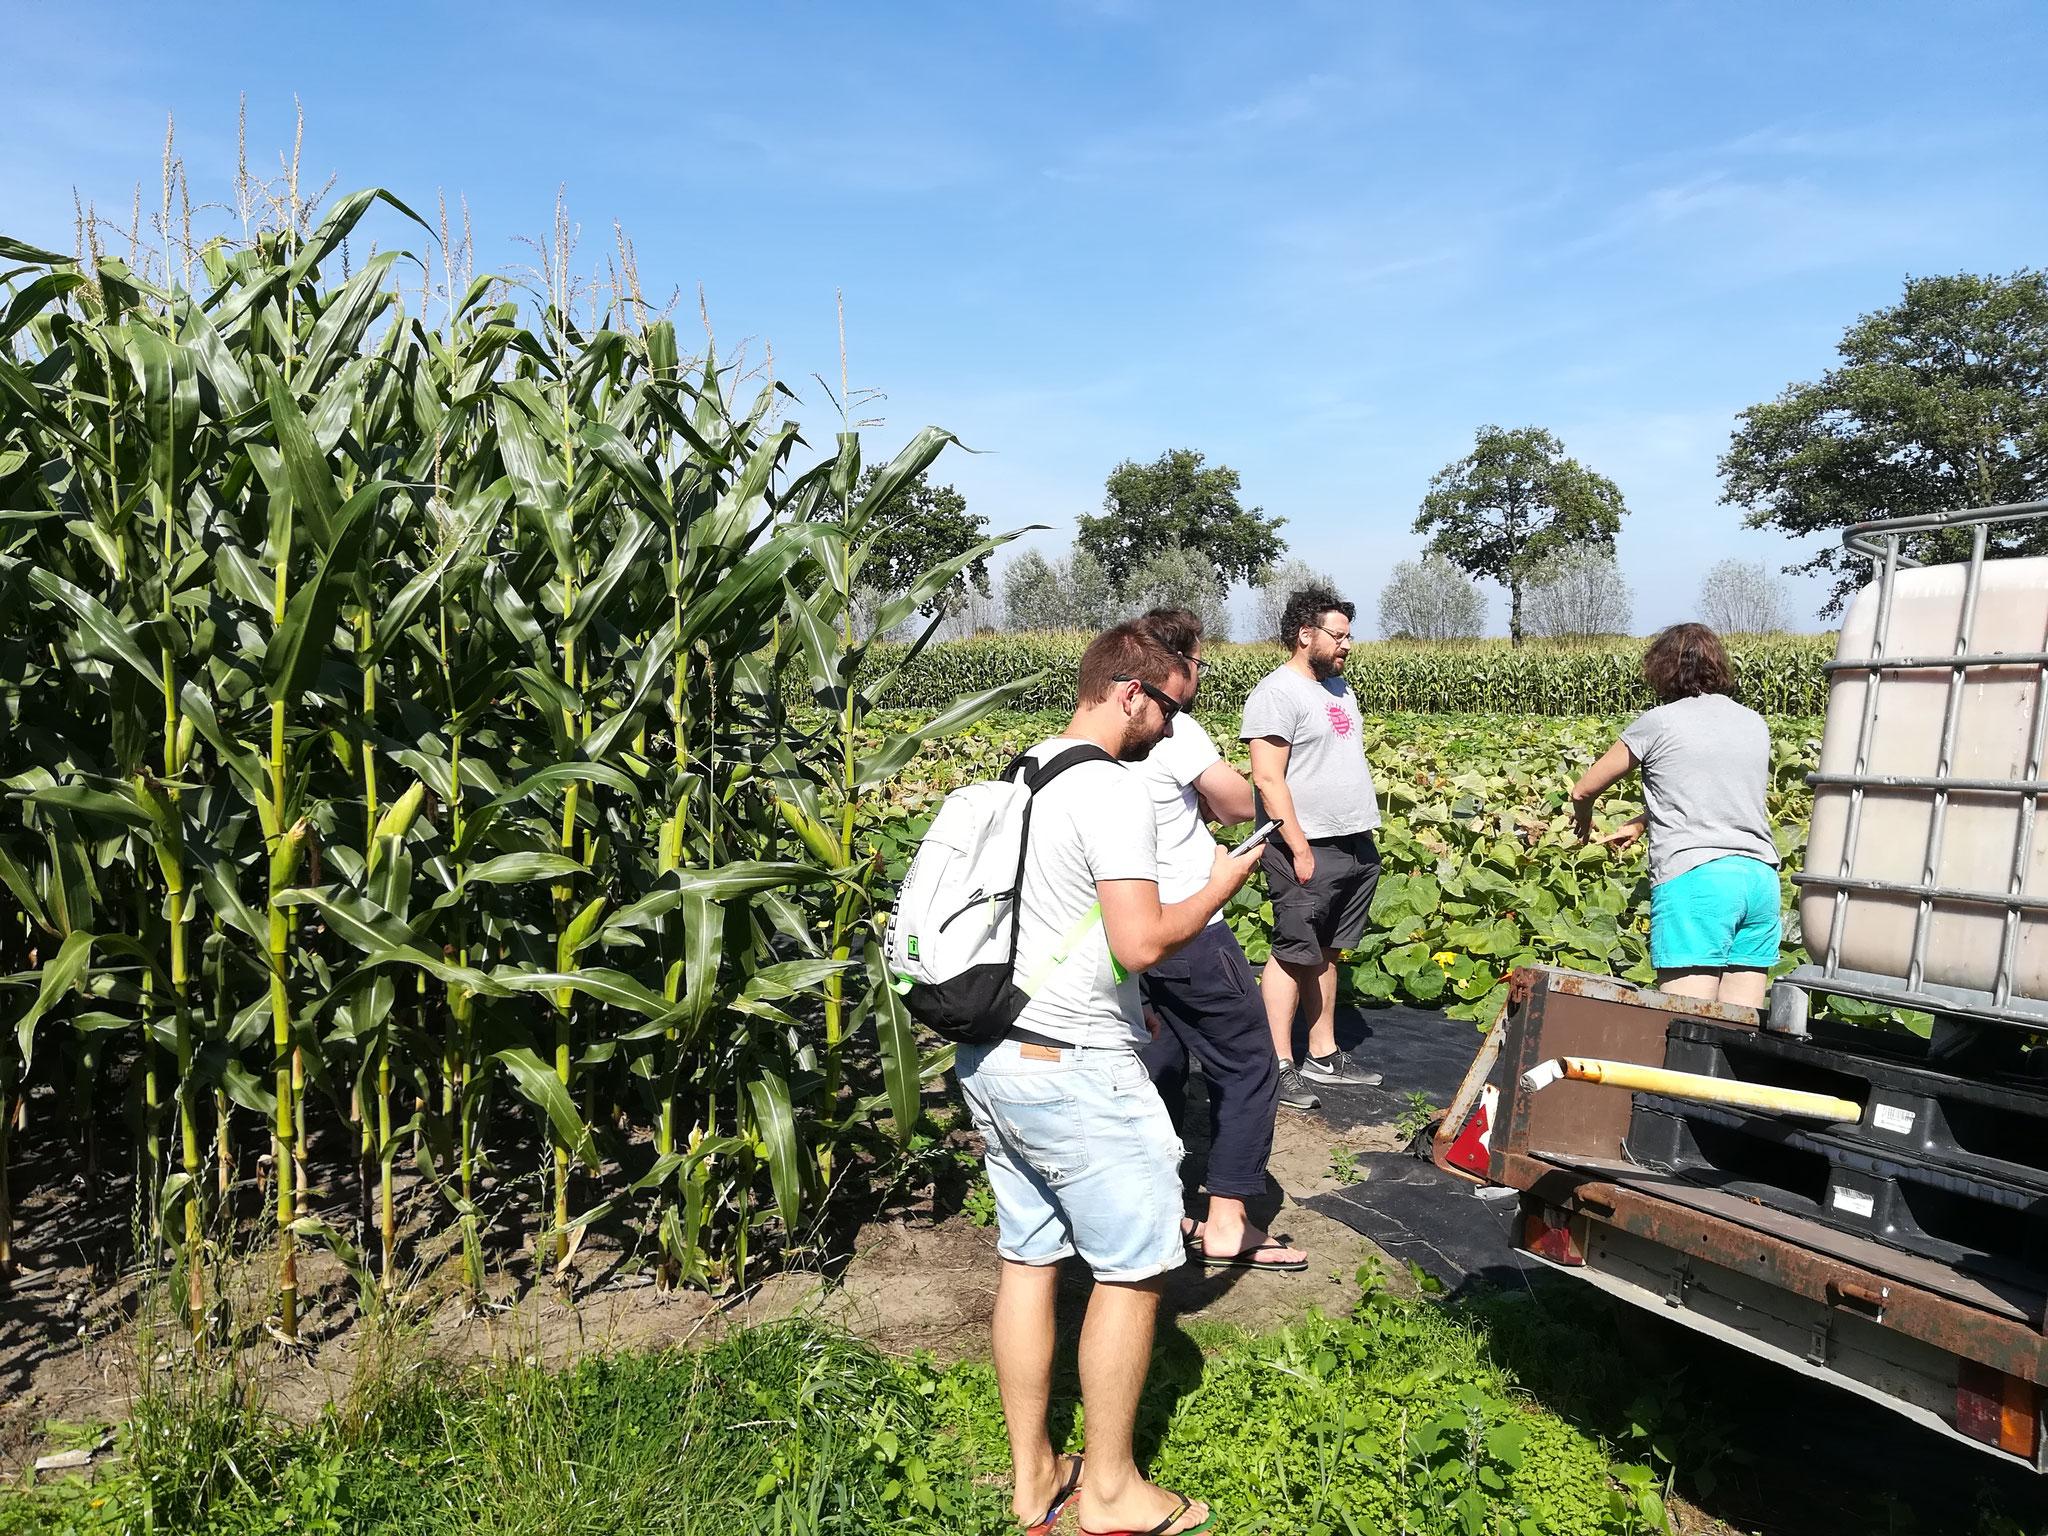 CONVIVIALITE - 2018 - Visite d'une plantation de calebasse en Hollande